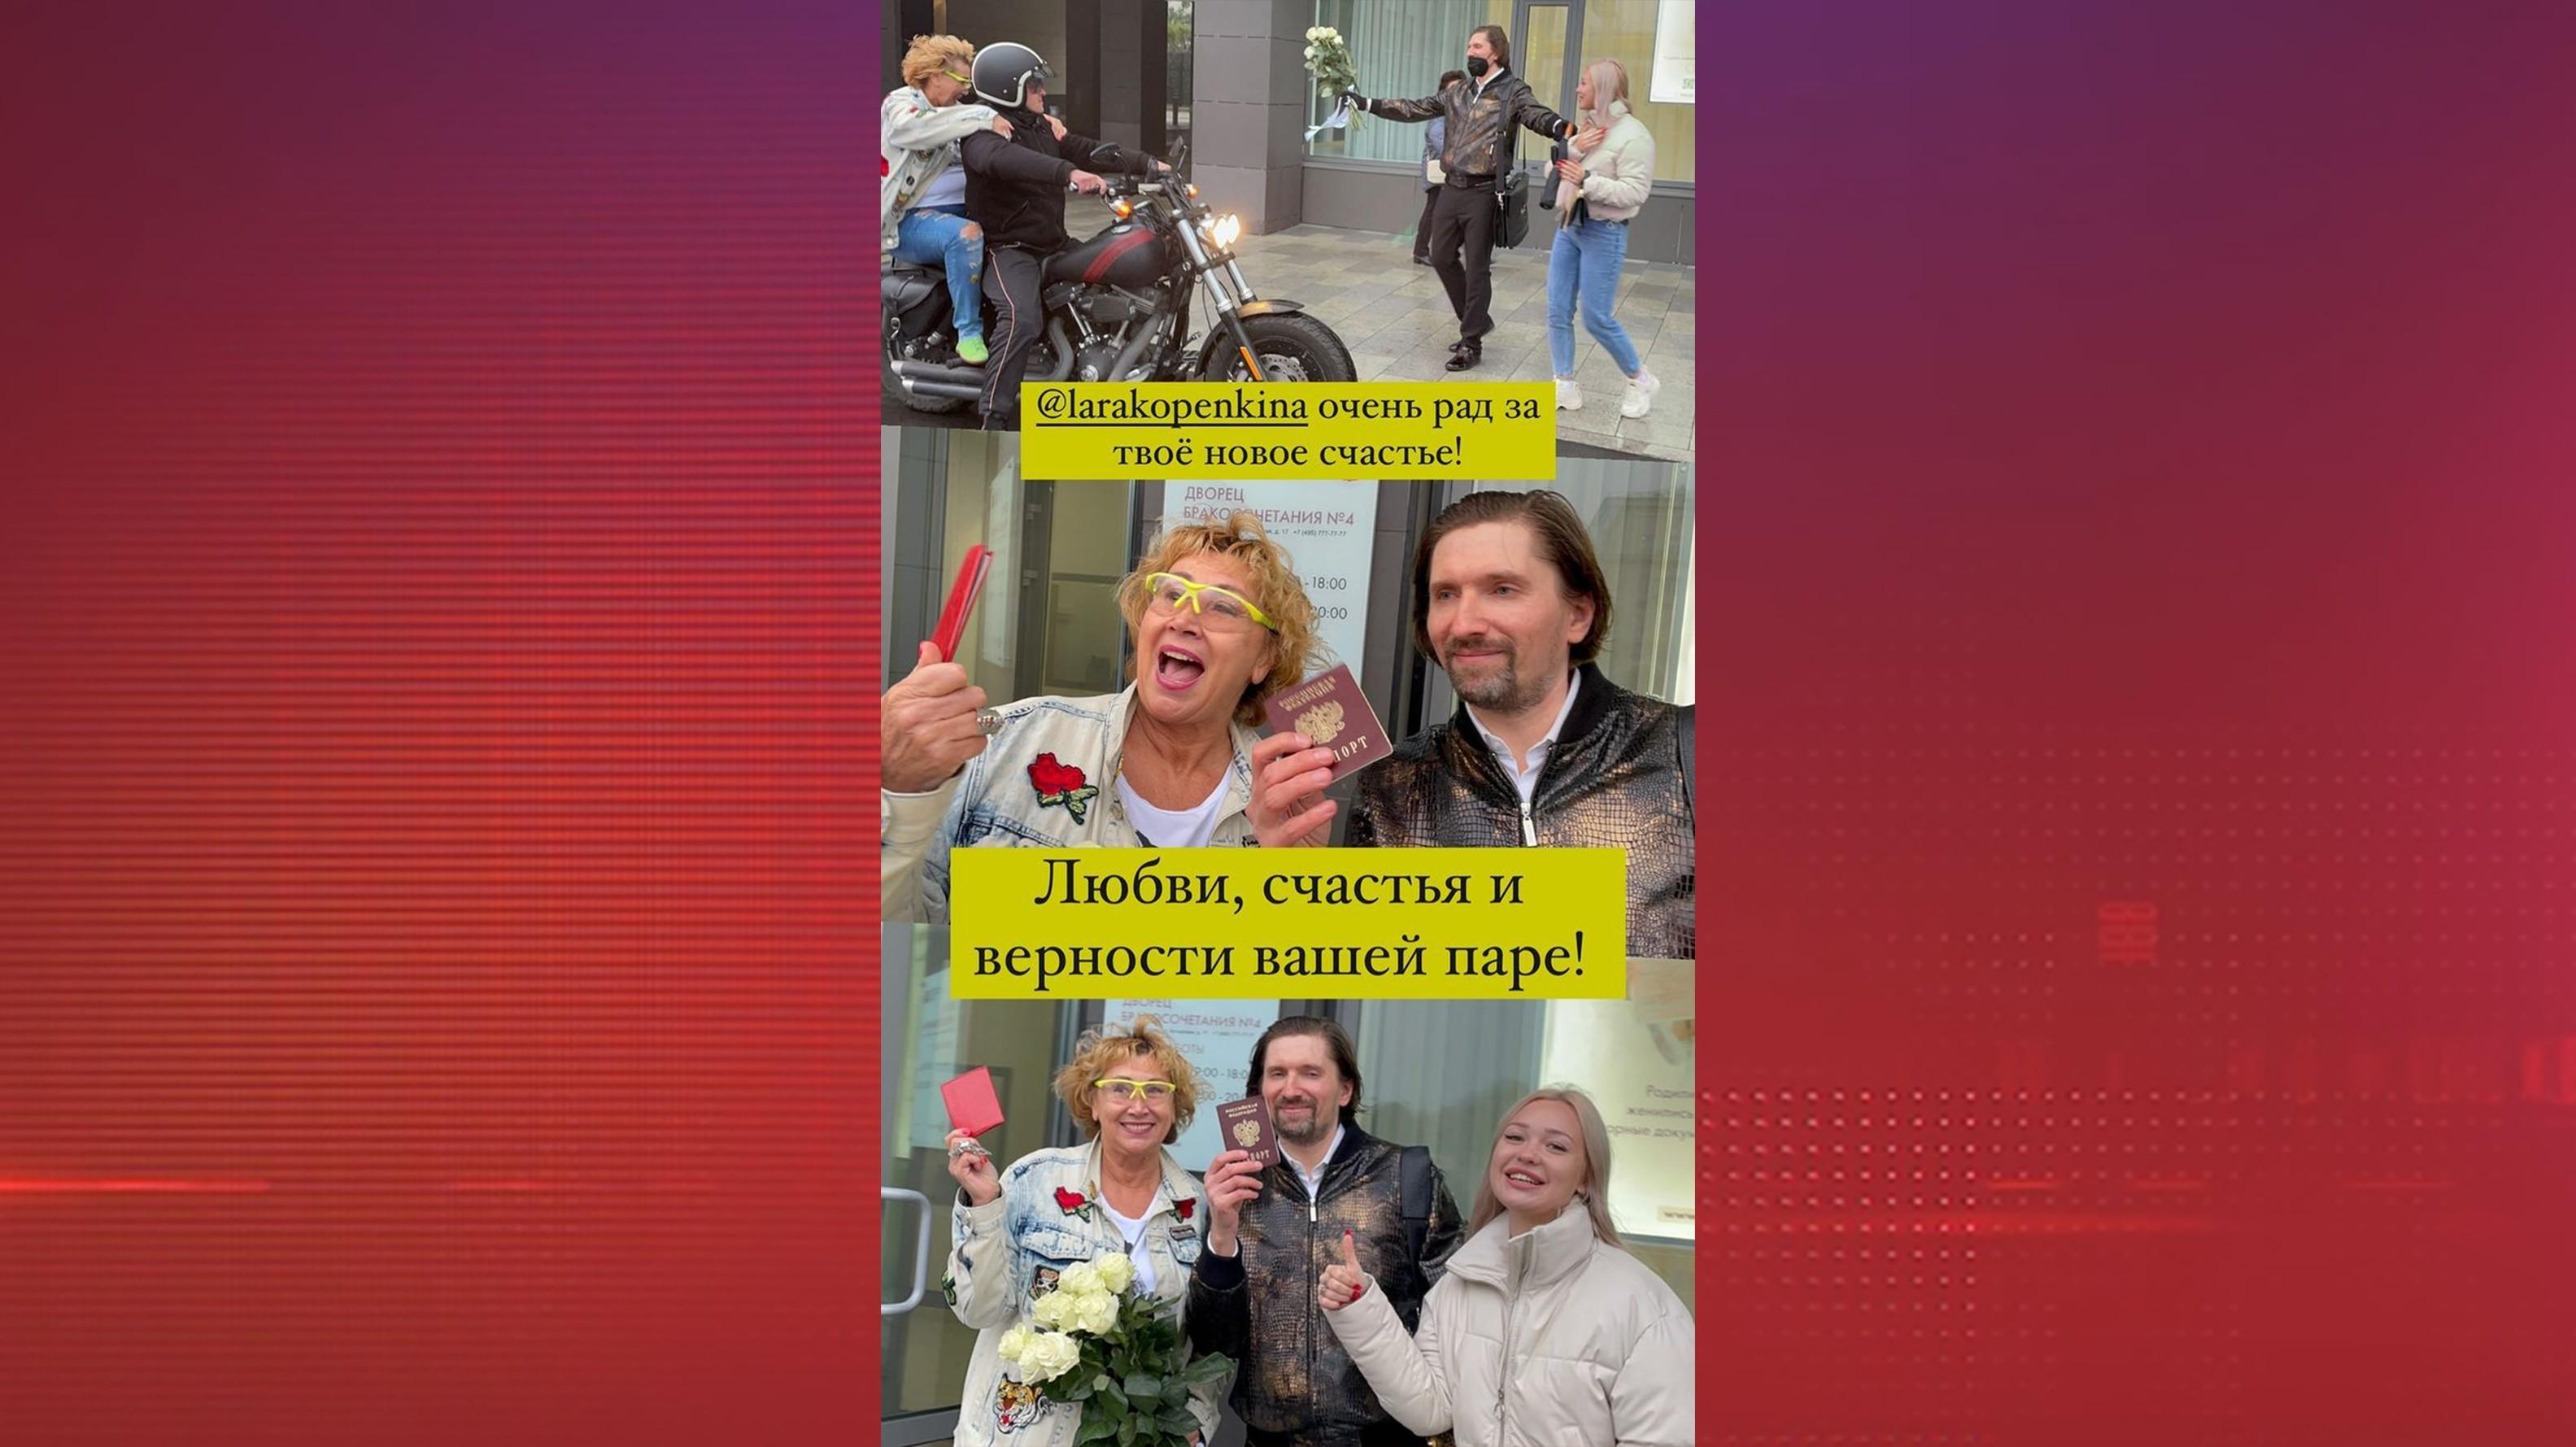 Лариса Копенкина объявила оскором замужестве иустроила вечеринку сраздеваниями